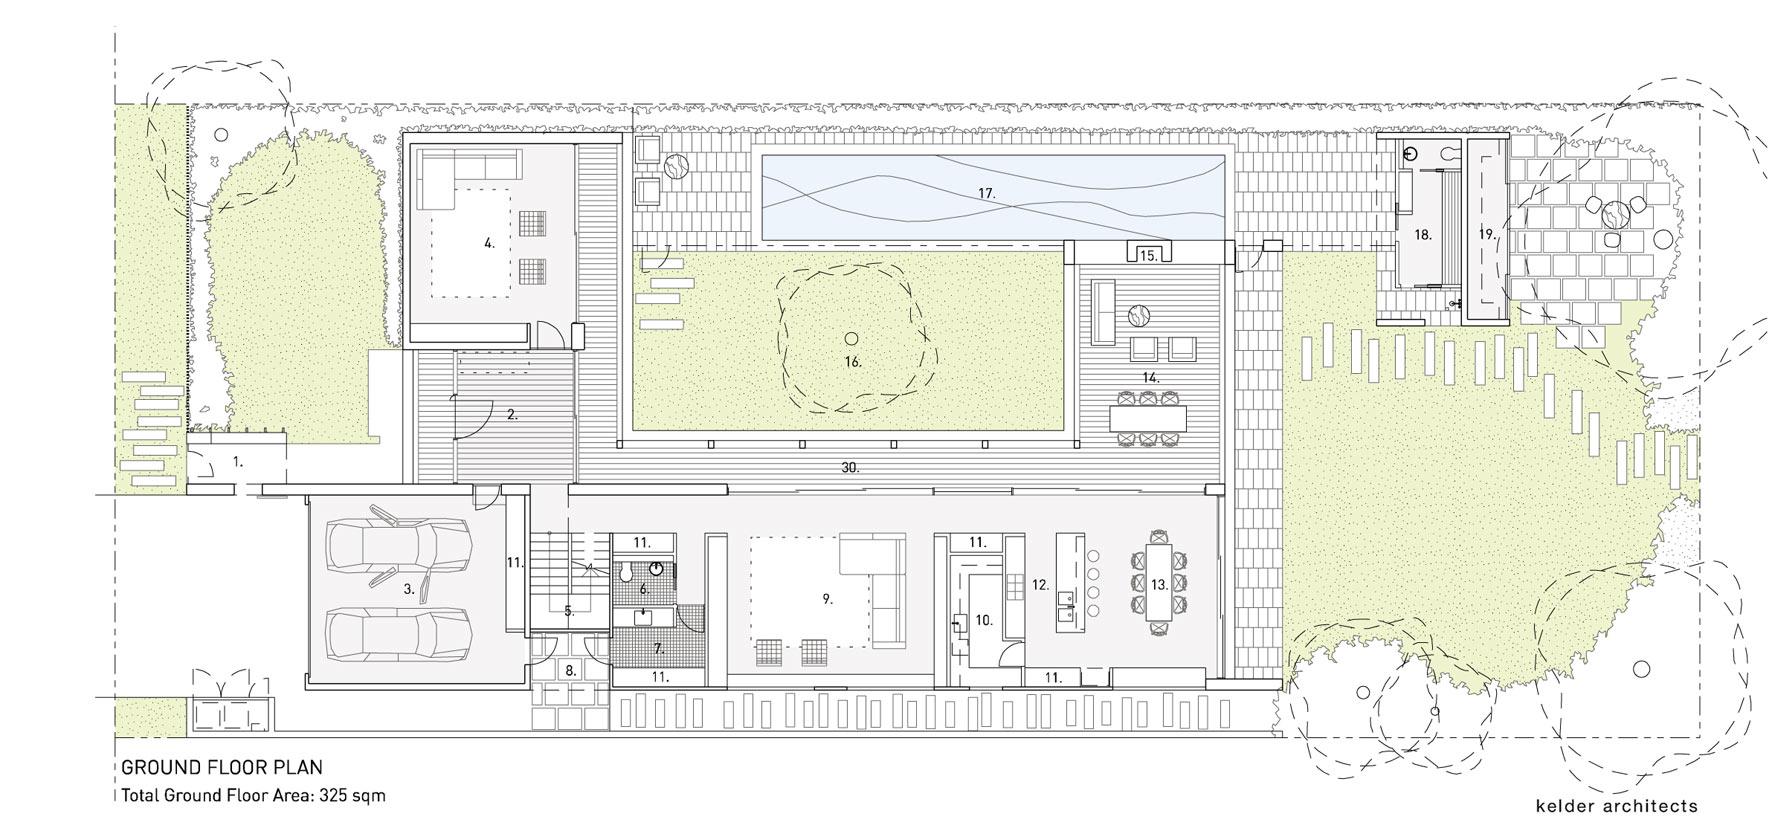 KA_casuarina-house-plan_web.jpg